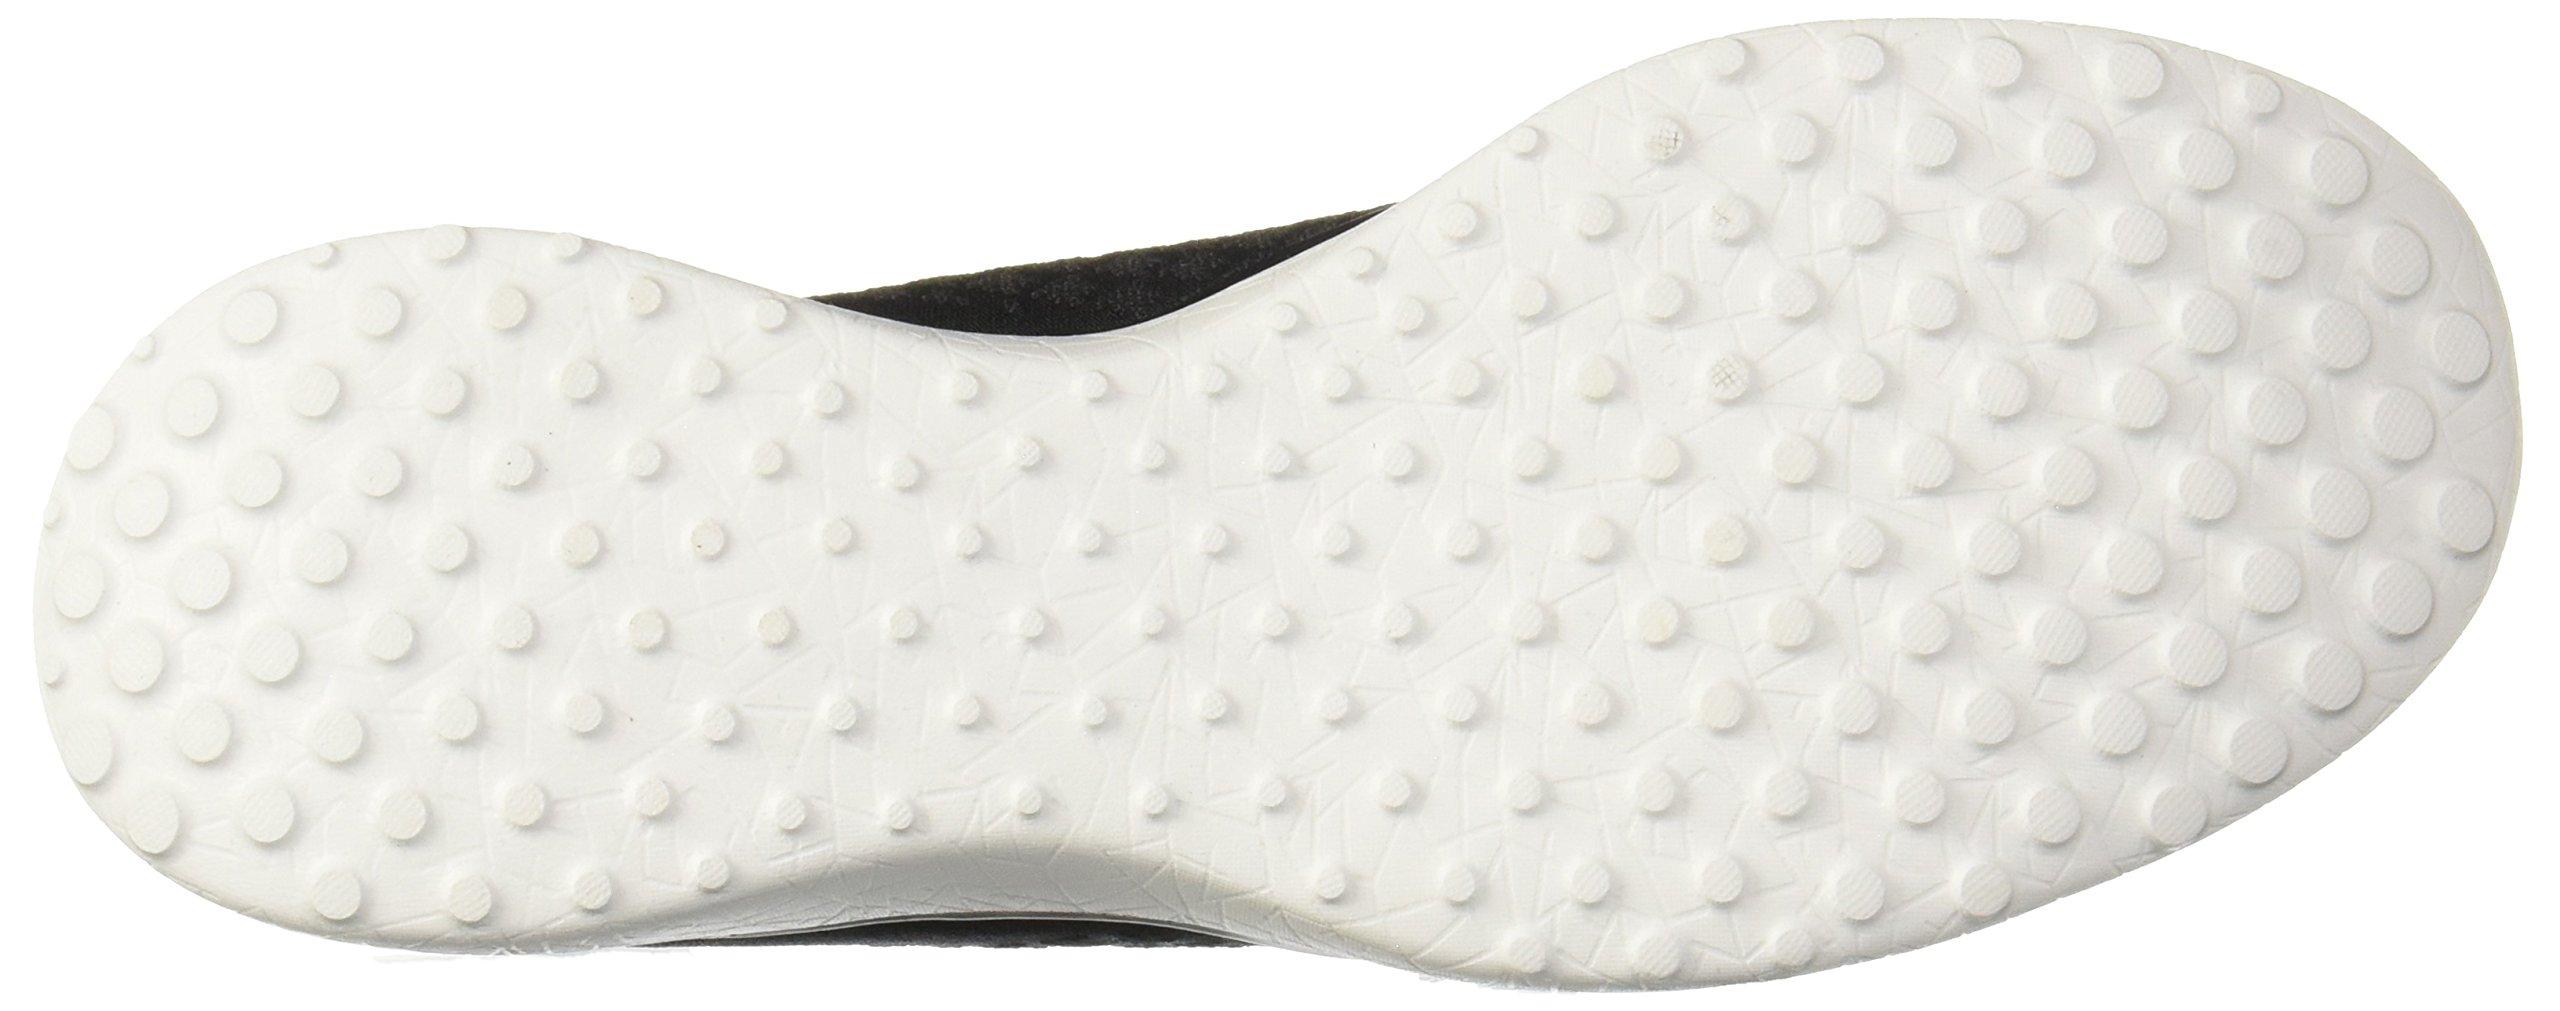 Skechers Women's Microburst One up Fashion Sneaker